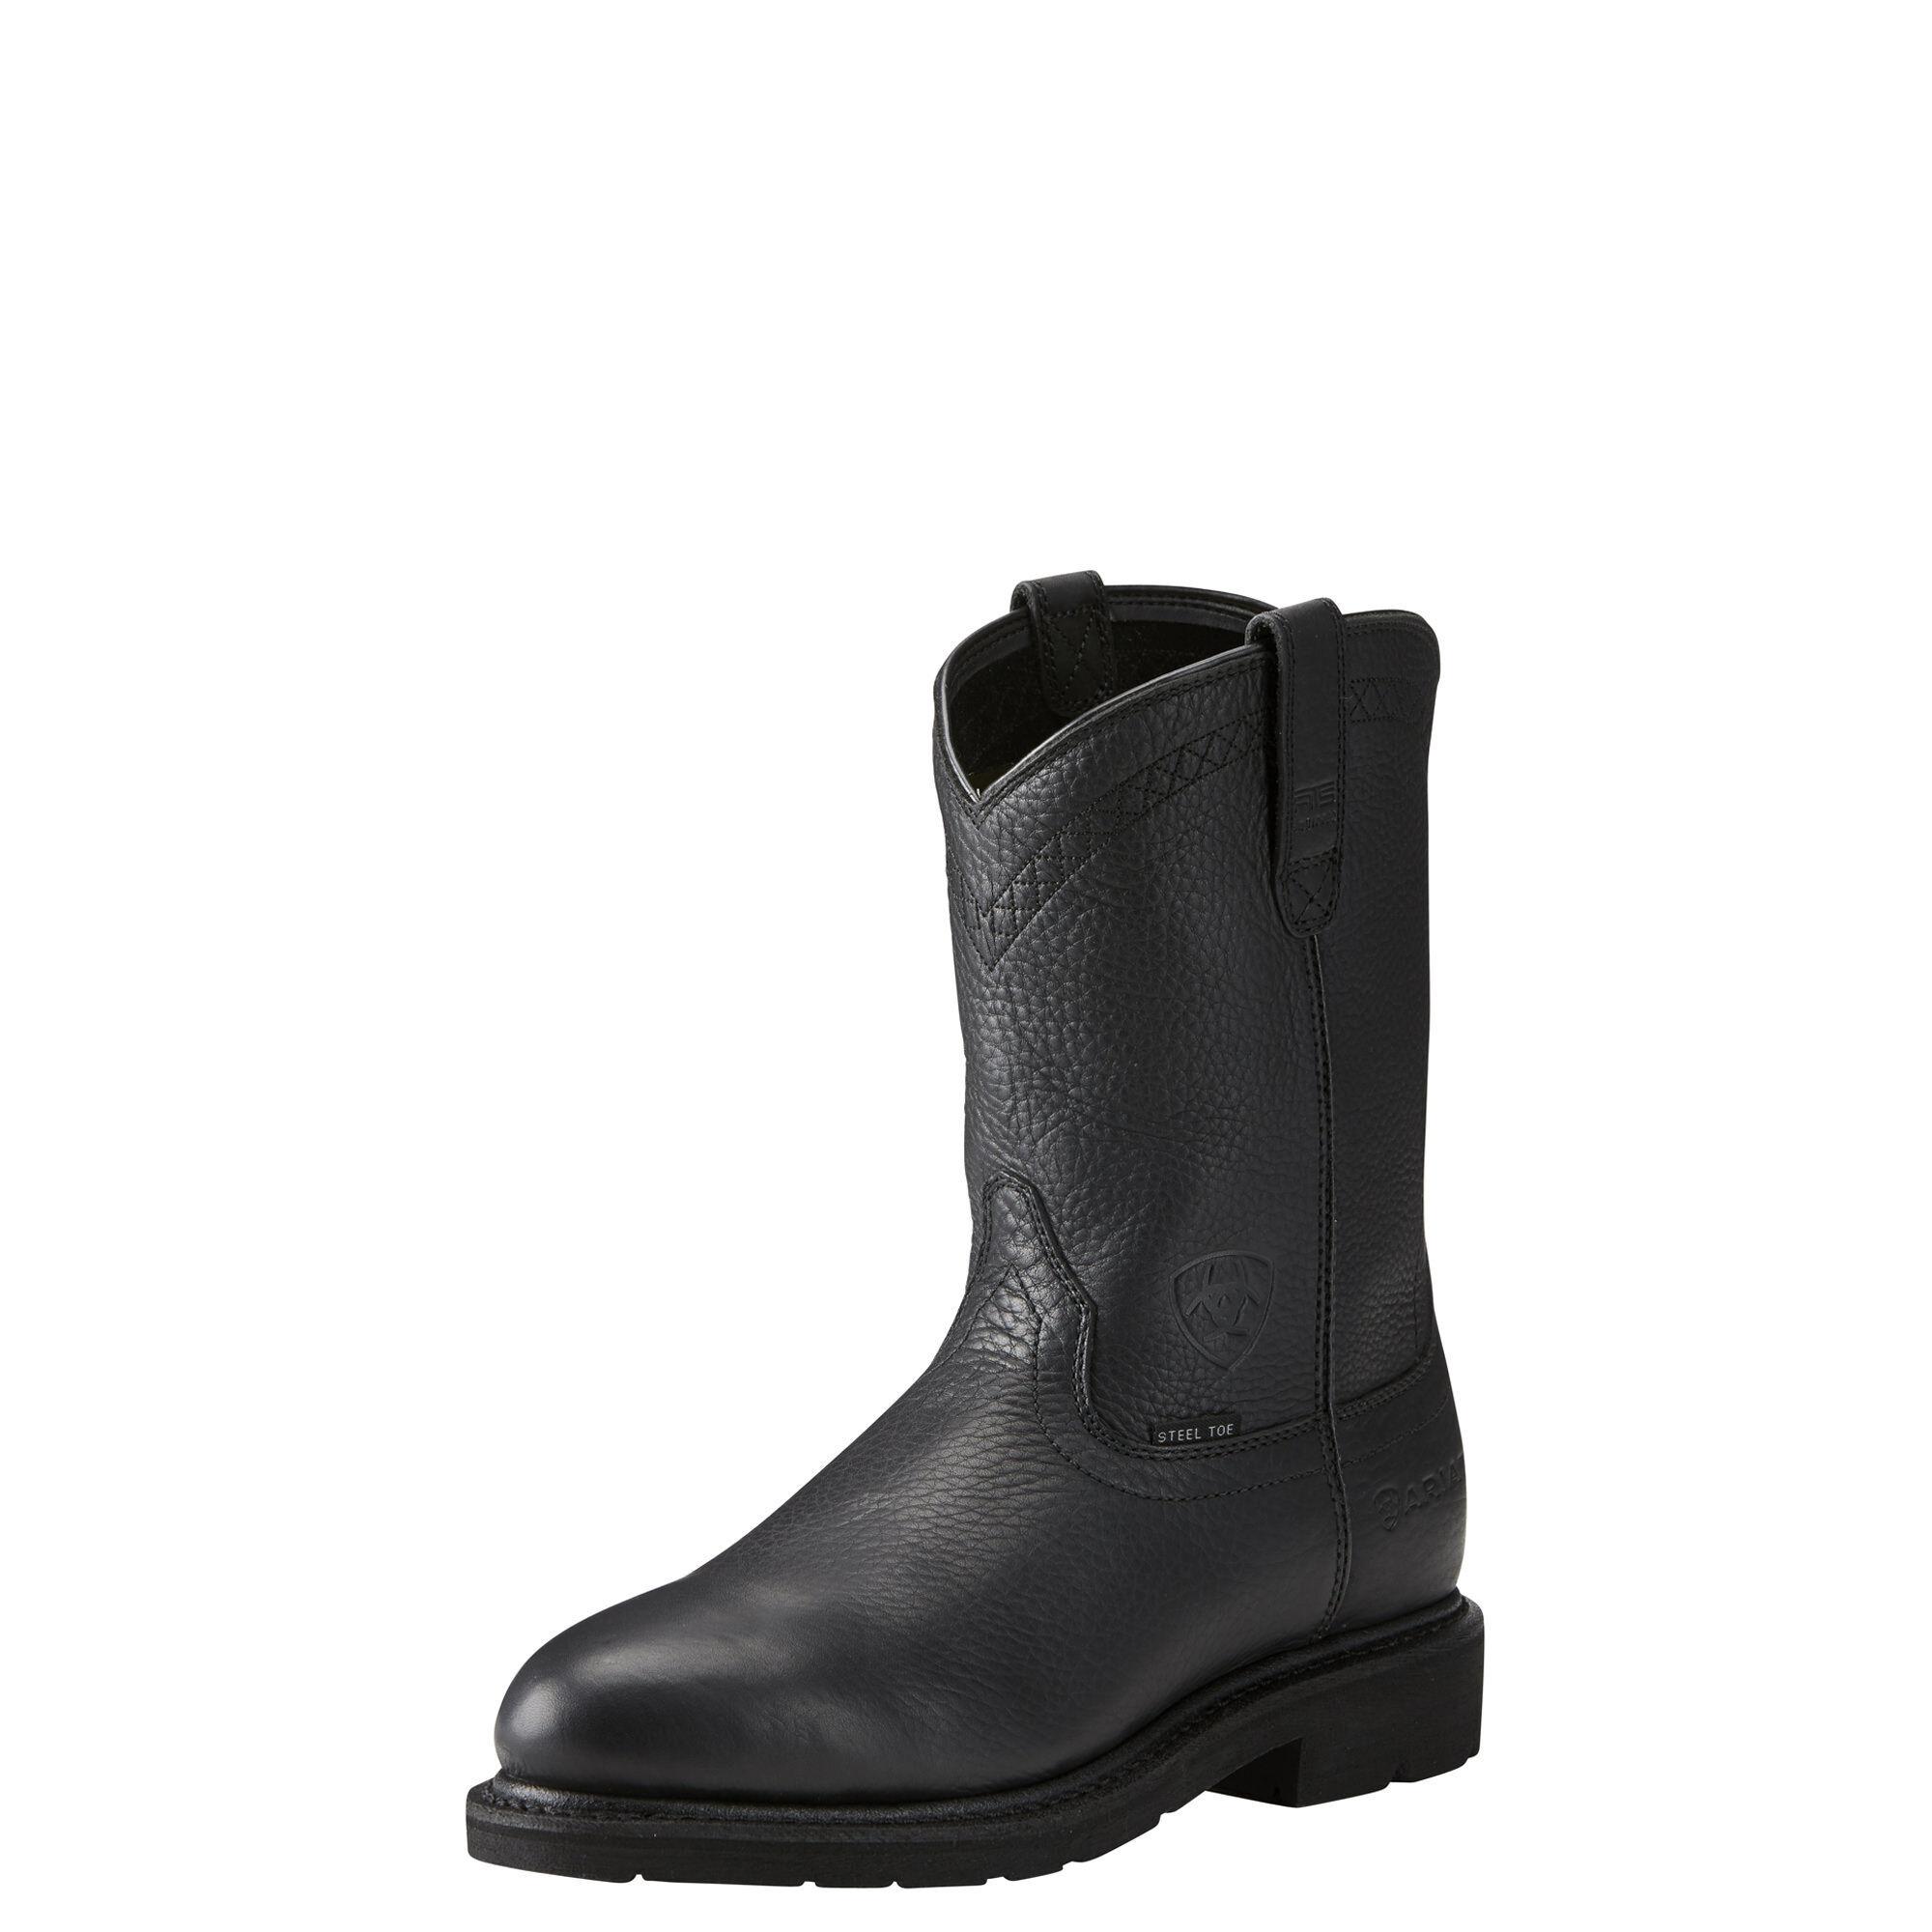 Ariat Men's Sierra Steel Toe Work Boots in Black Leather, Size 7.5 D / Medium by Ariat